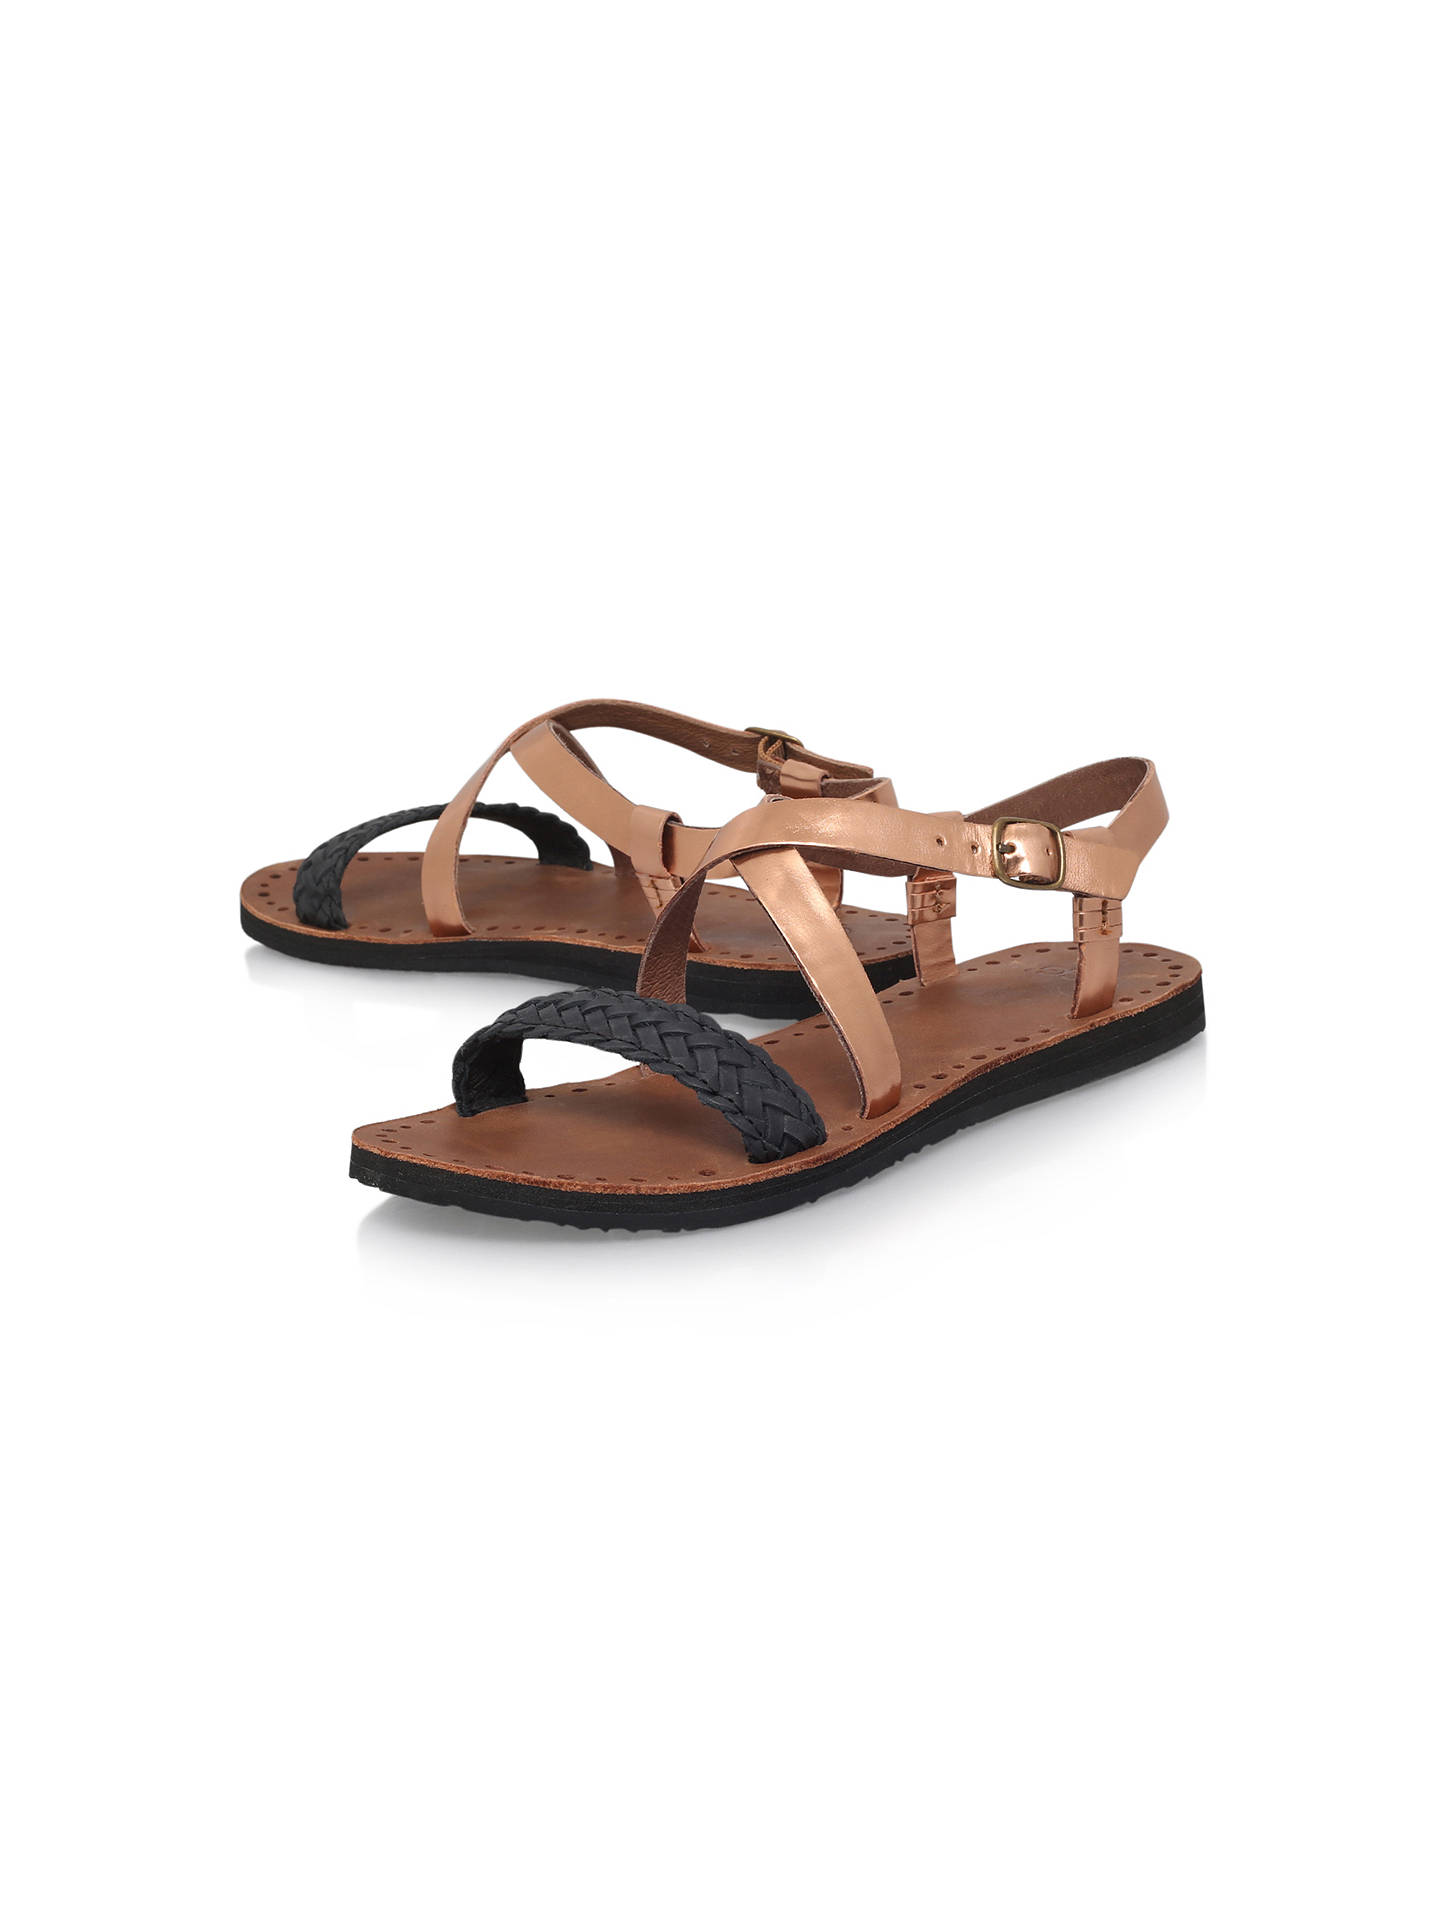 a536442a154 UGG Jordyne Cross Strap Sandals at John Lewis & Partners